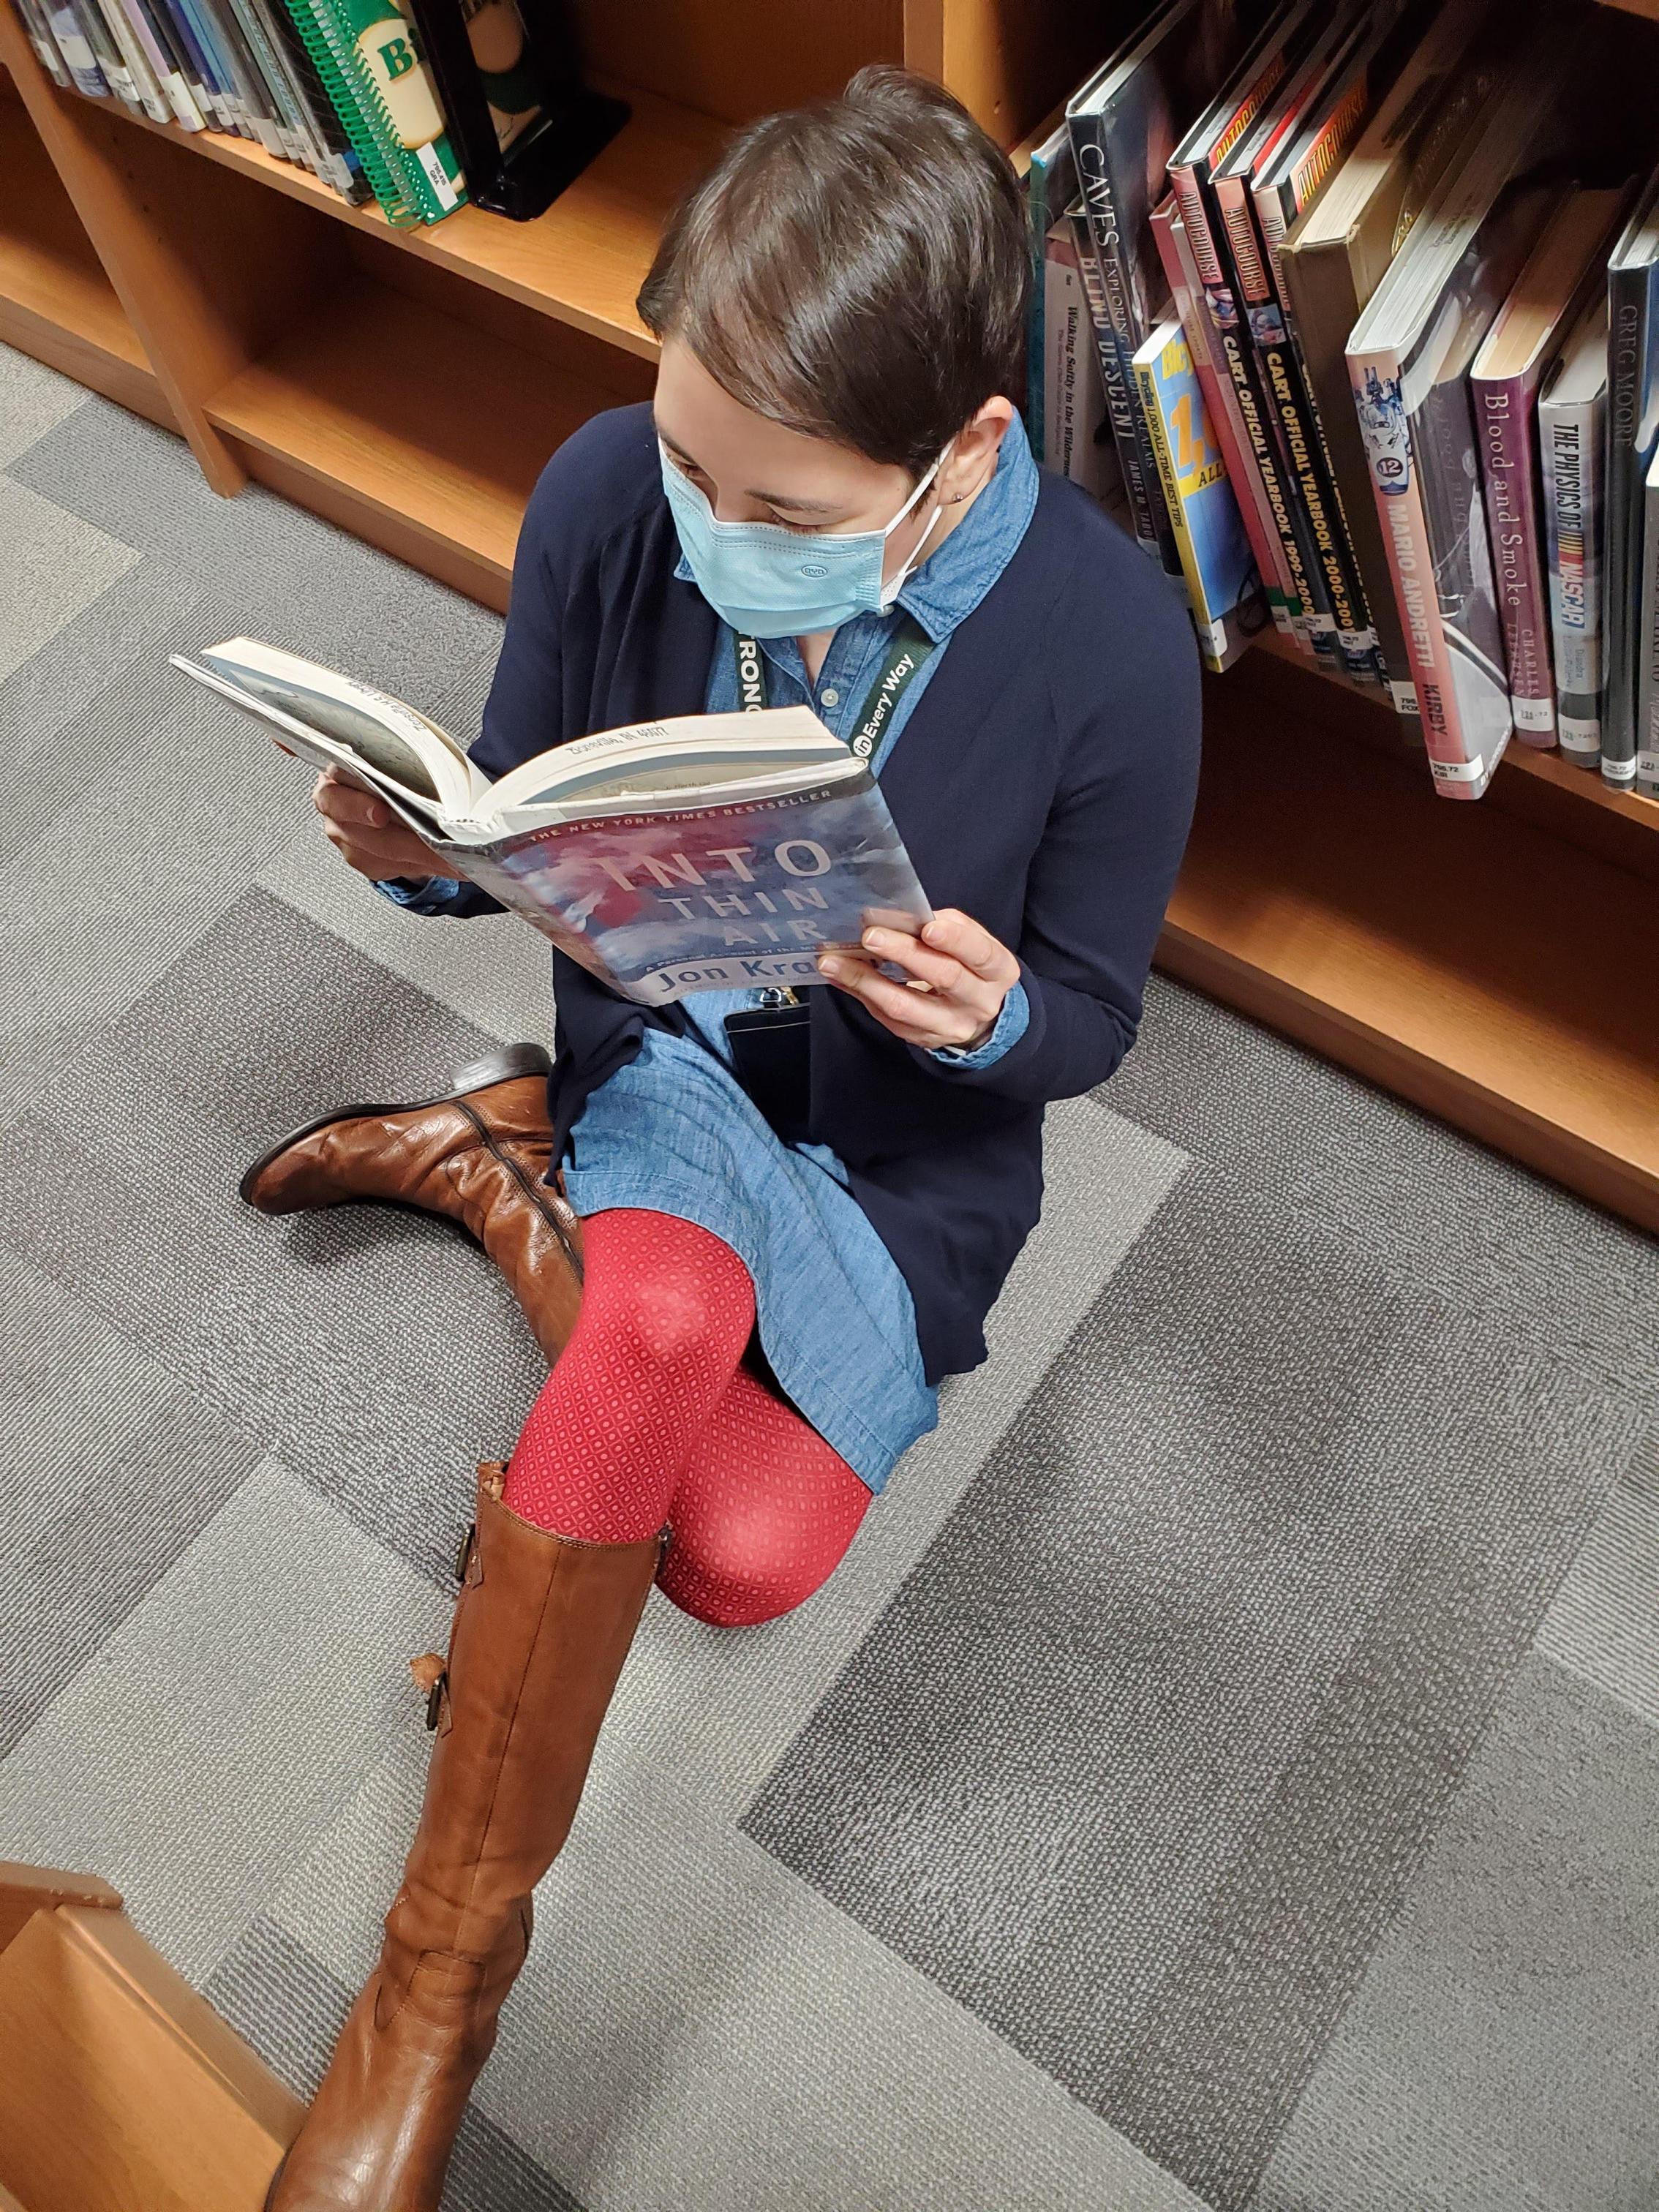 Library Shelfie Day!